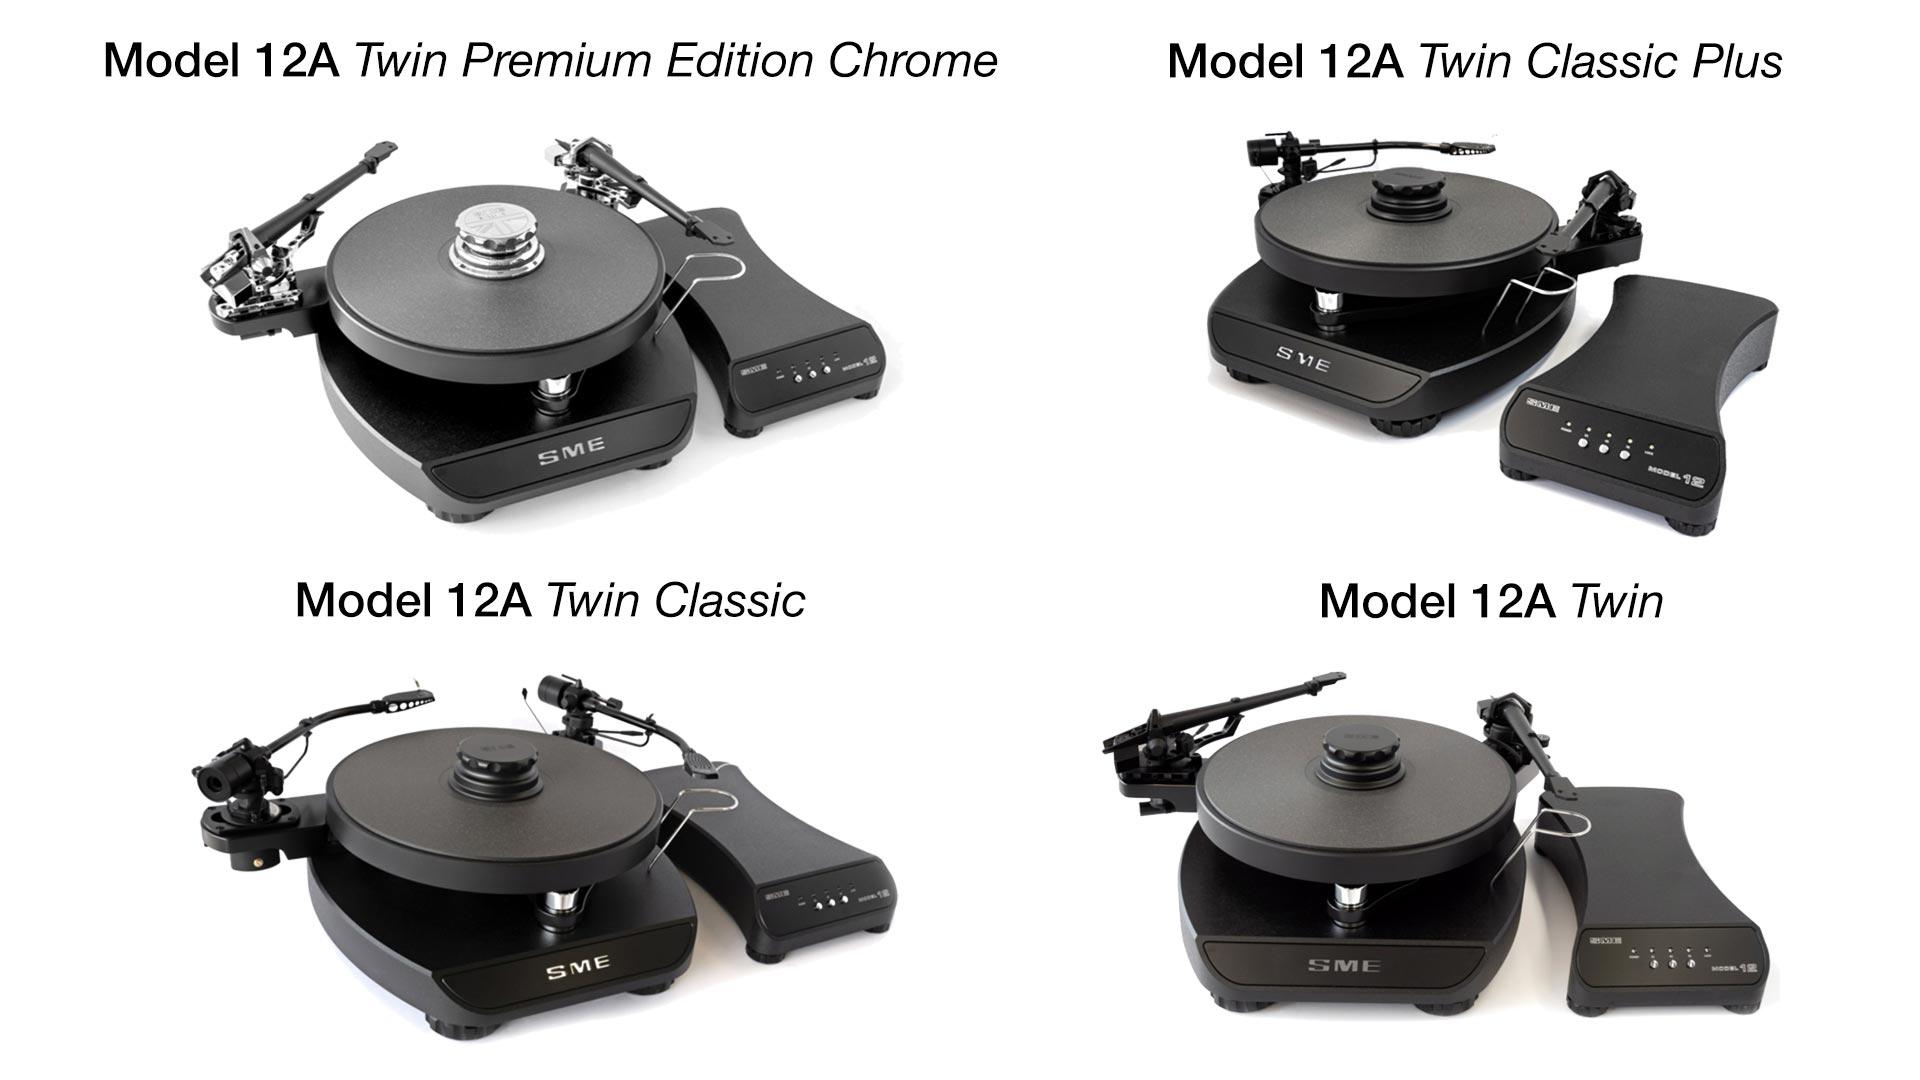 SME Audio Preview Twin Tonearm & Premium Chrome Editions | Unilet Sound & Vision